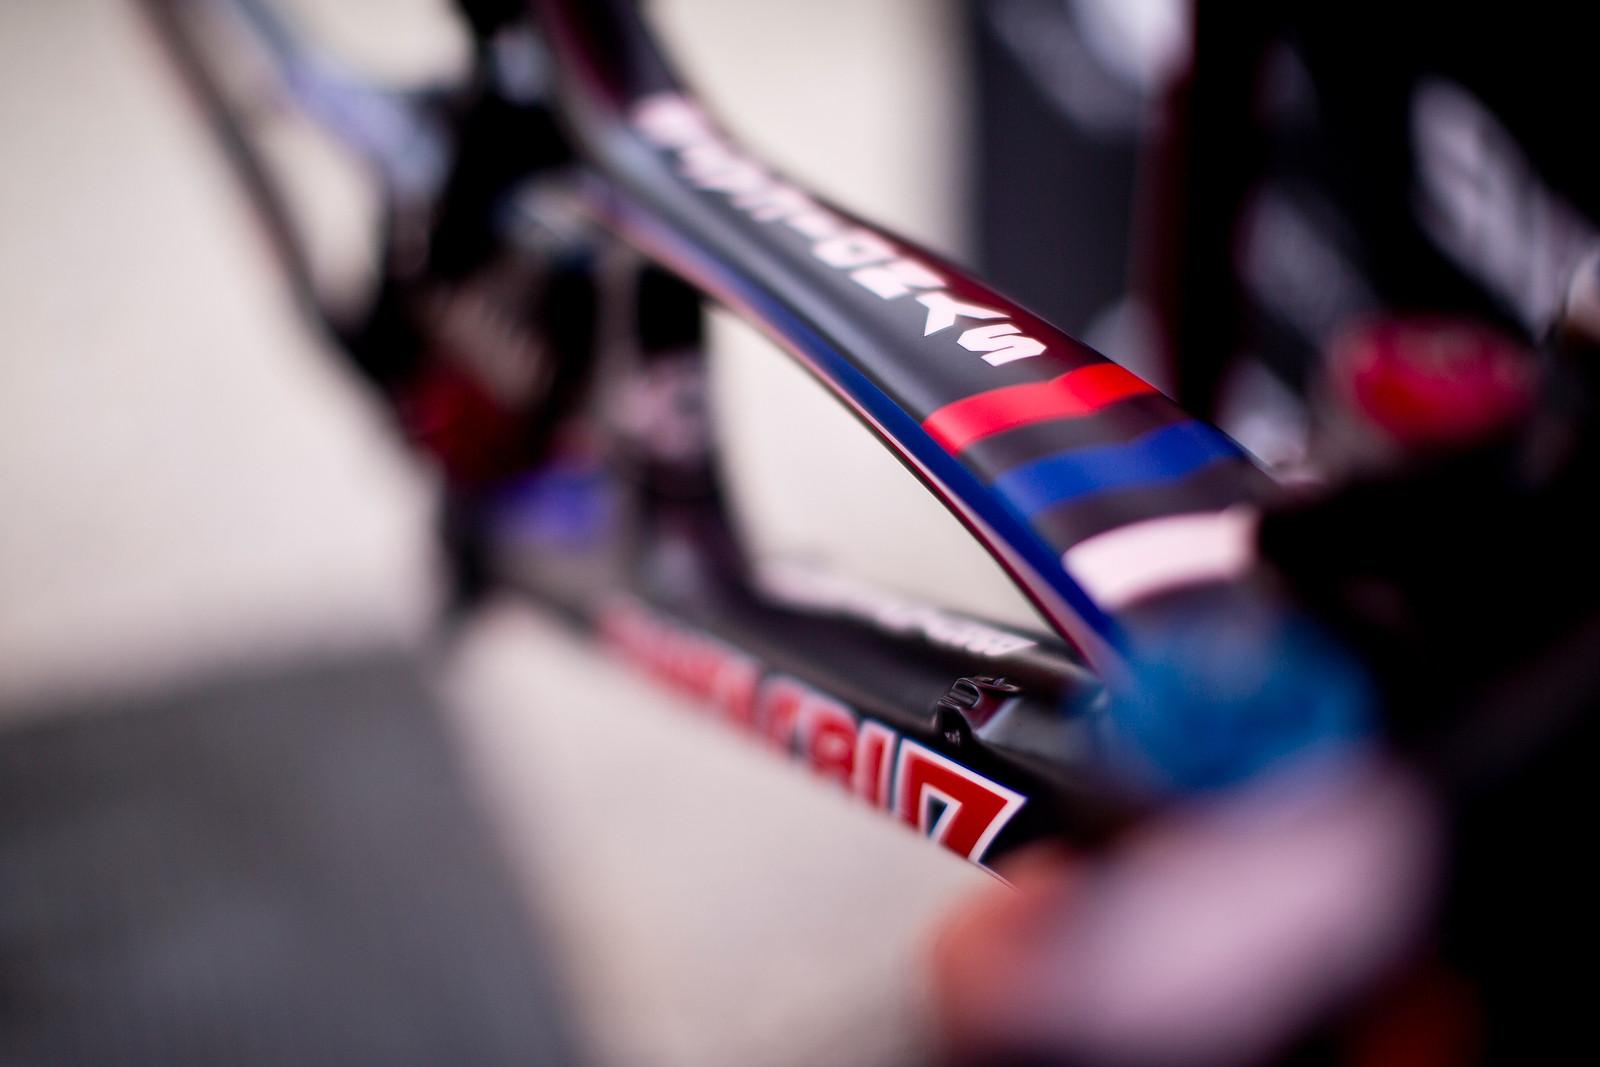 Josh Bryceland's World Champs Edition Santa Cruz V10c - New Kits and Gear for 2012 World Championships - Mountain Biking Pictures - Vital MTB